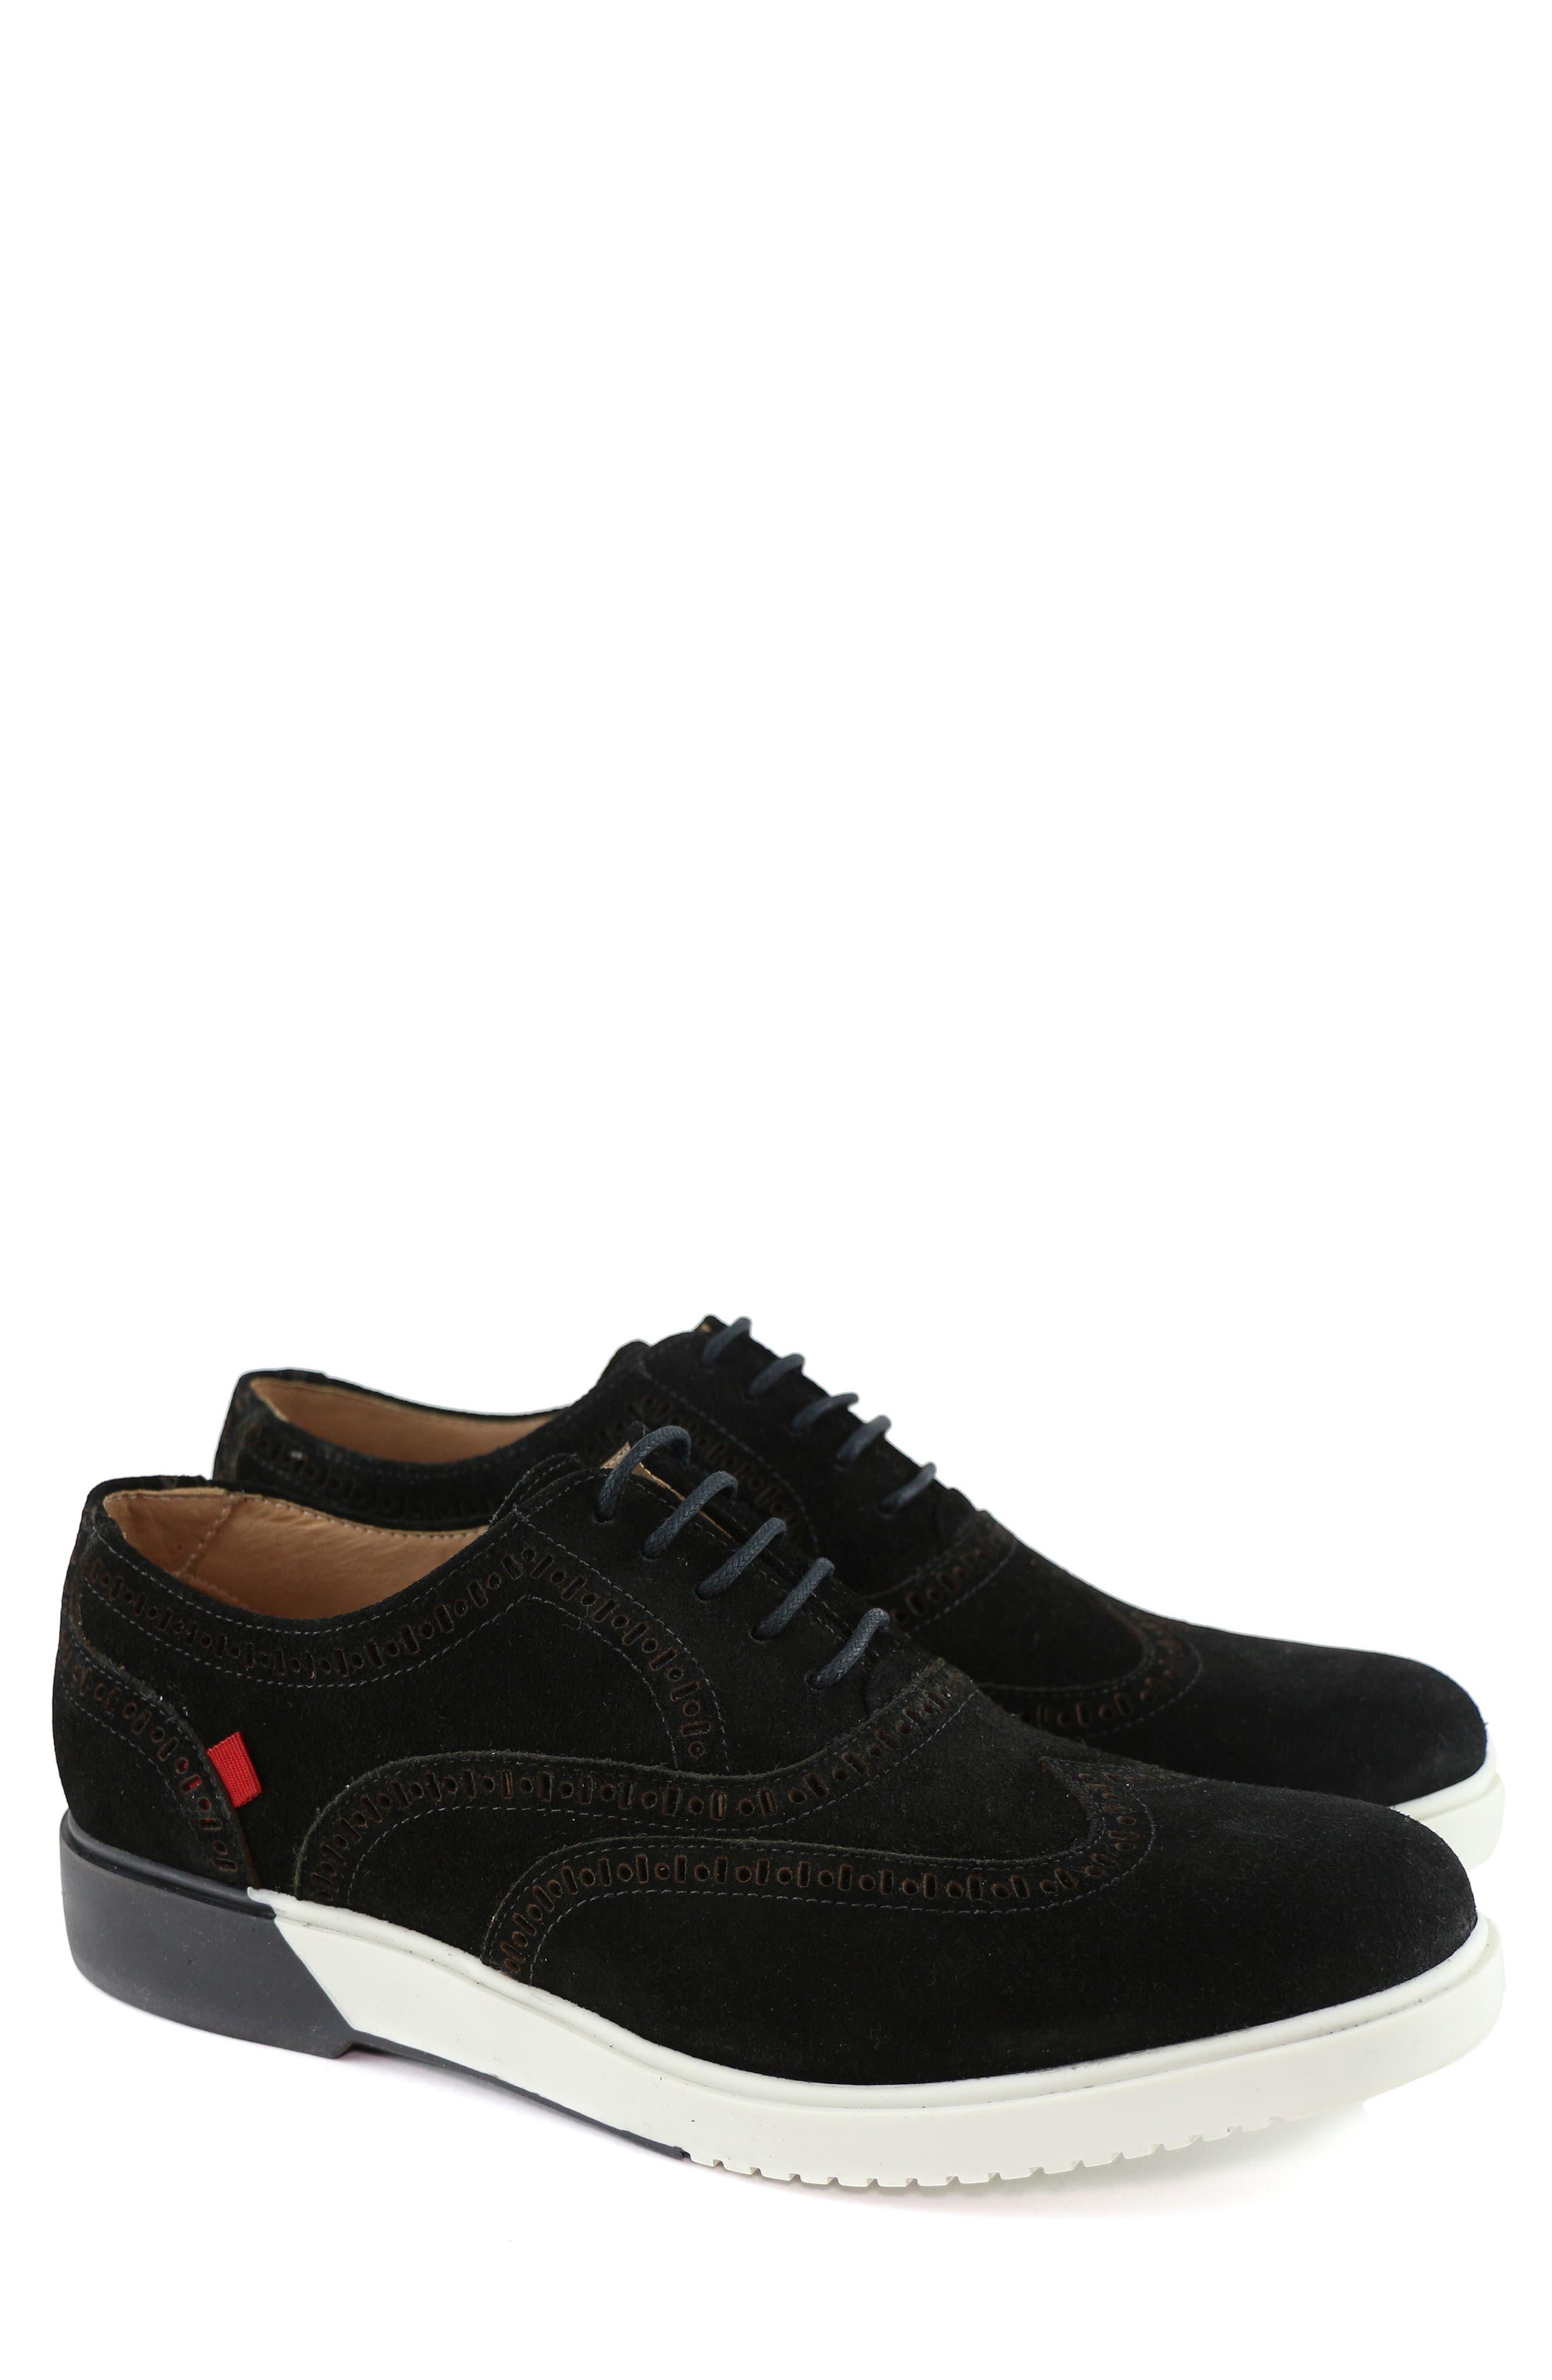 5th Ave Wingtip Sneaker,                             Alternate thumbnail 30, color,